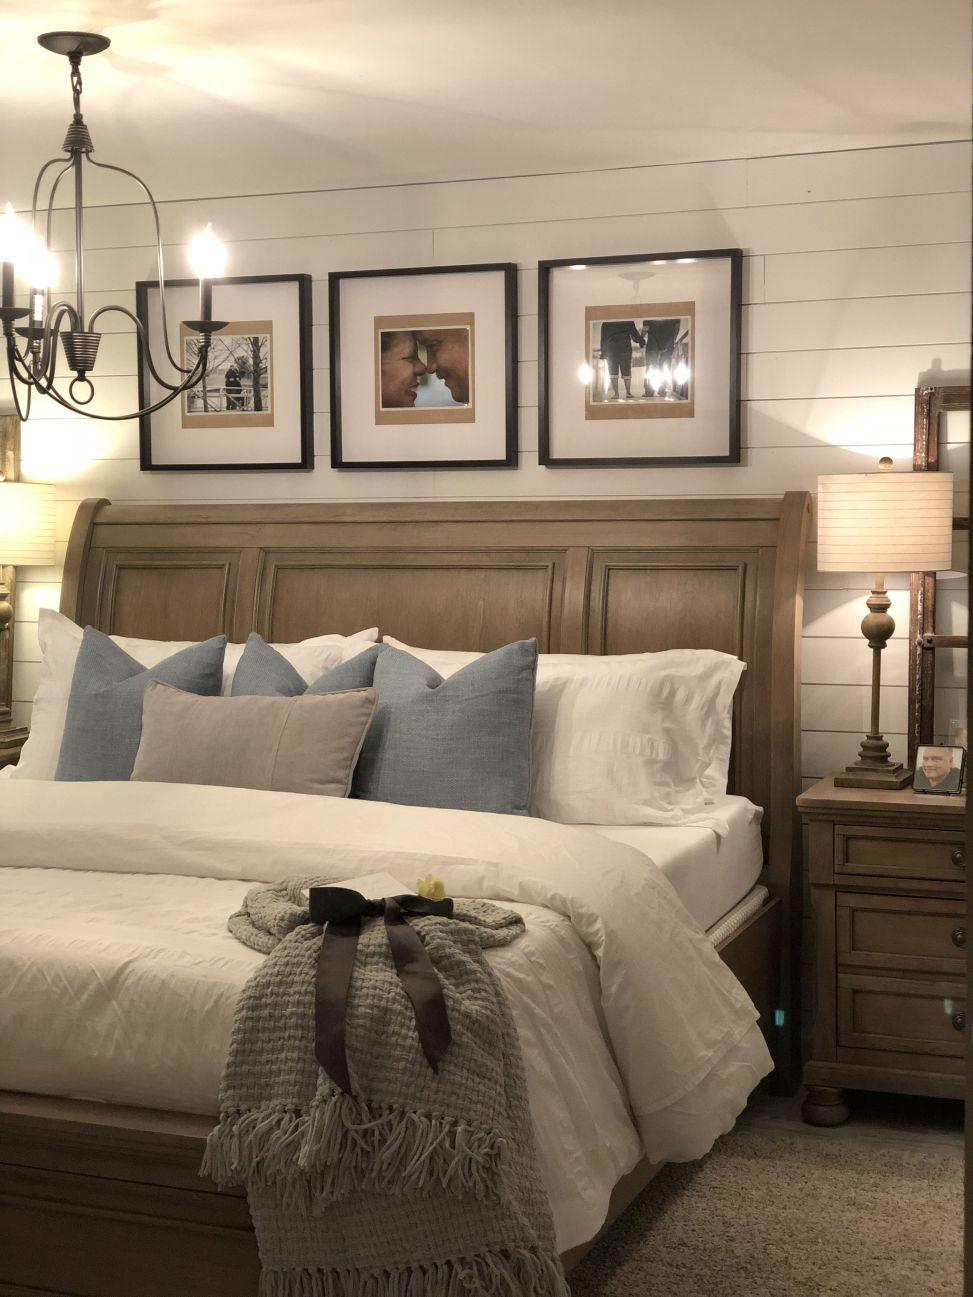 cozy farmhouse master bedroom decor ideas 45 in 2020 on modern cozy bedroom decorating ideas id=40454